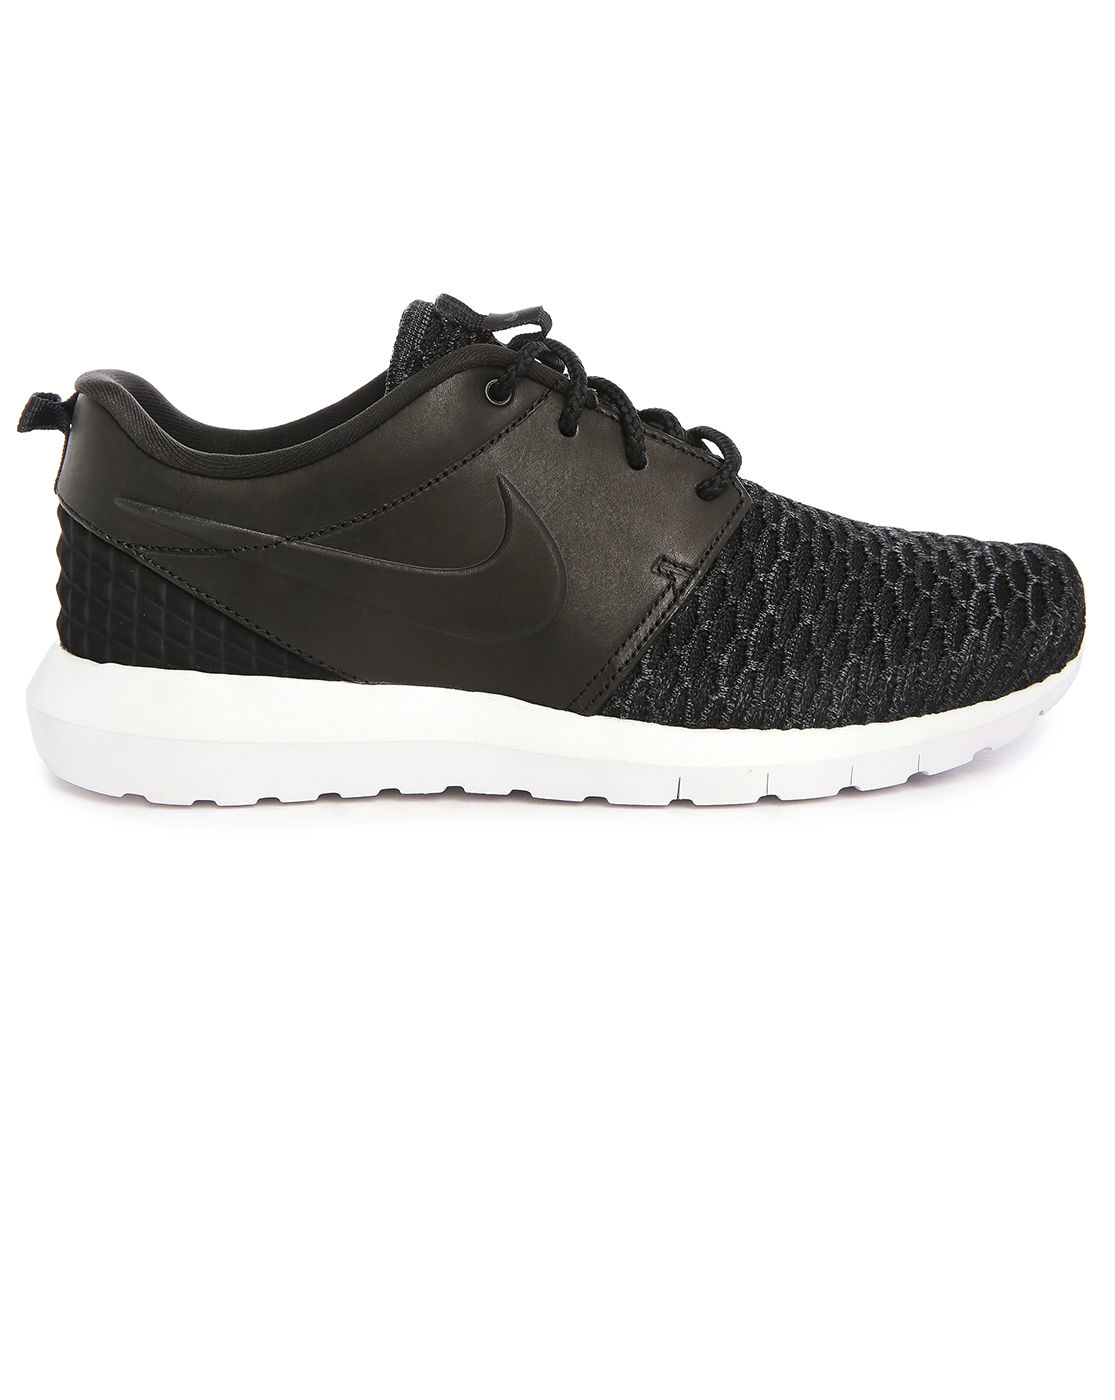 Nike Flyknit Roshe Run Qs Black Midnight Fog Black Pictures to pin on